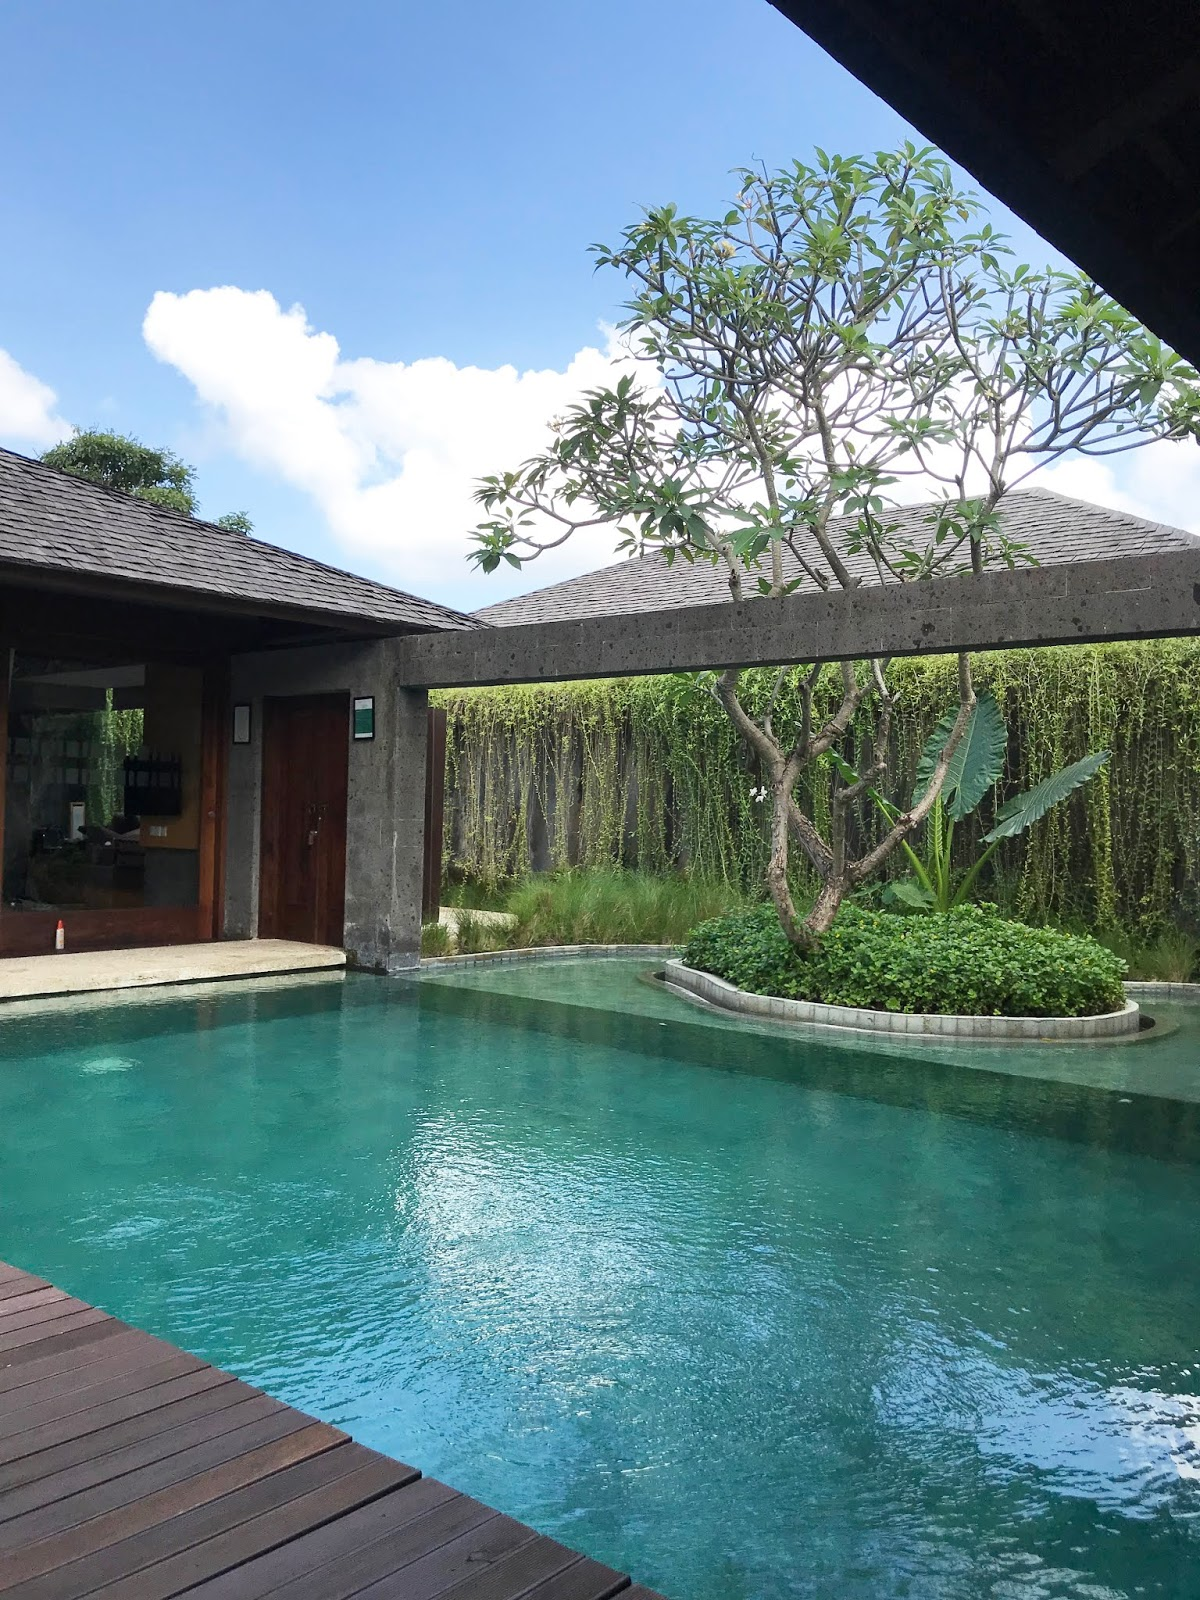 The Santai Pool